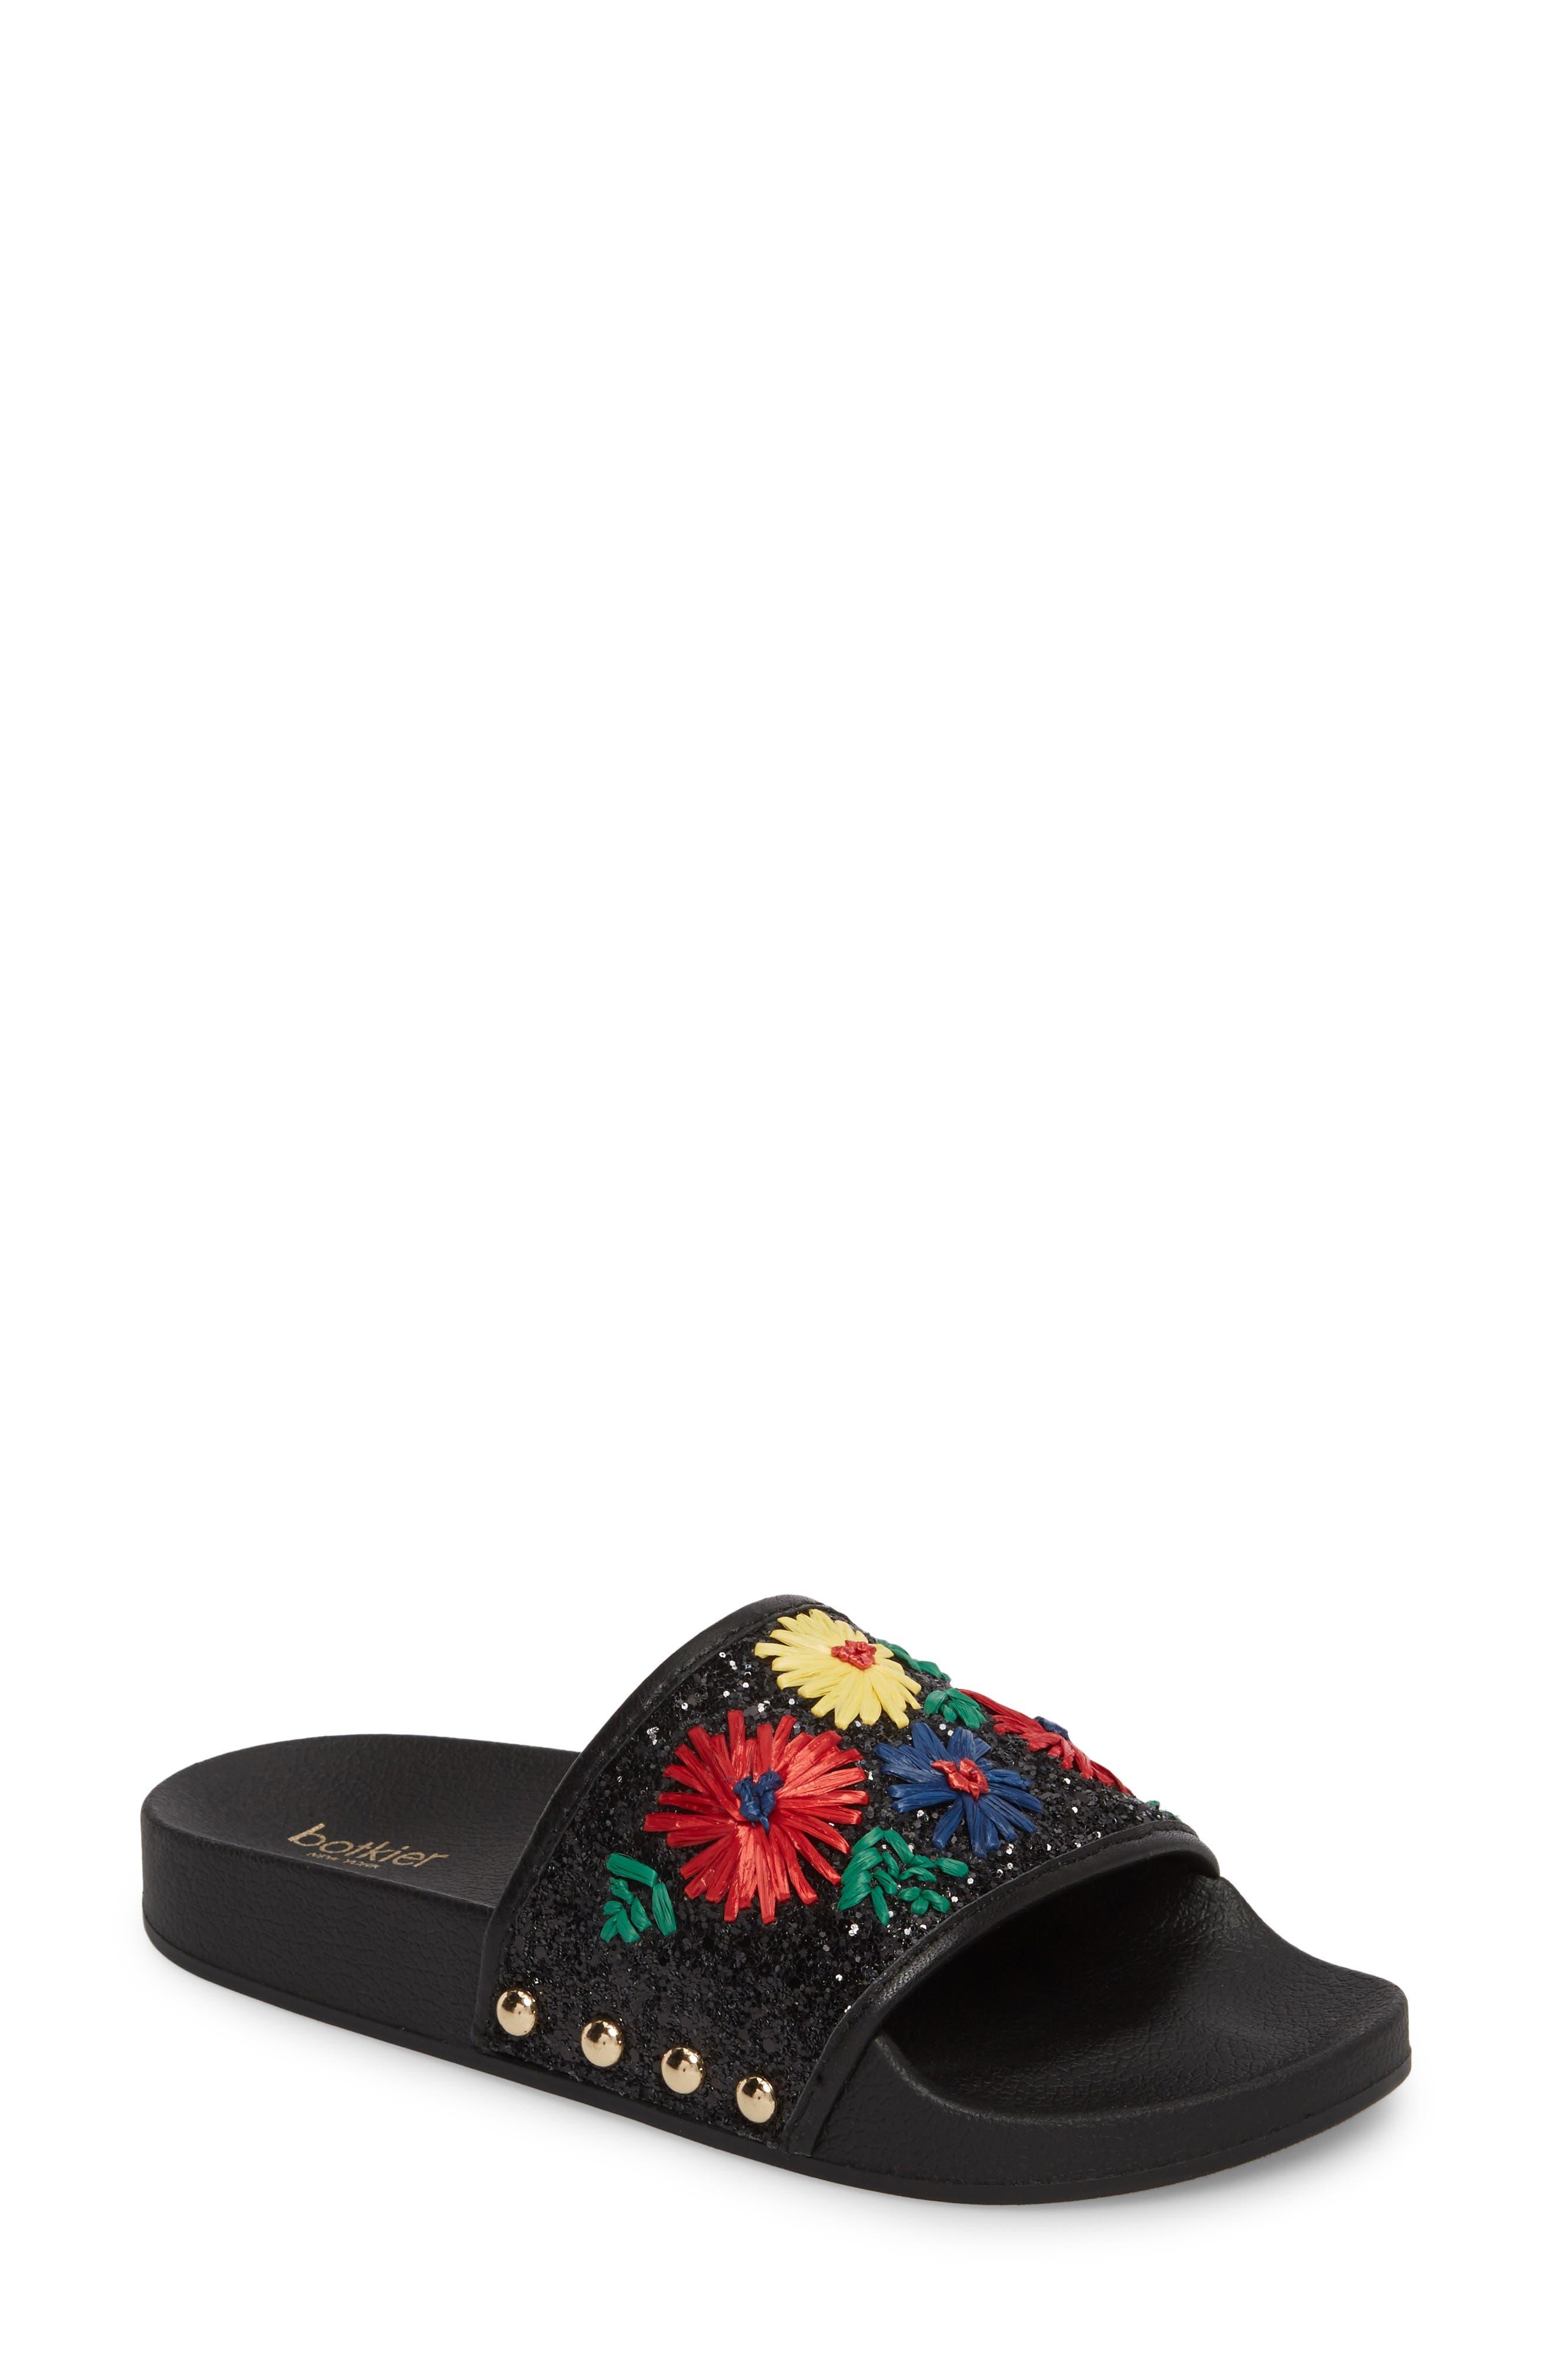 Daisy Slide Sandal,                         Main,                         color, BRIGHT FLORAL PRINT